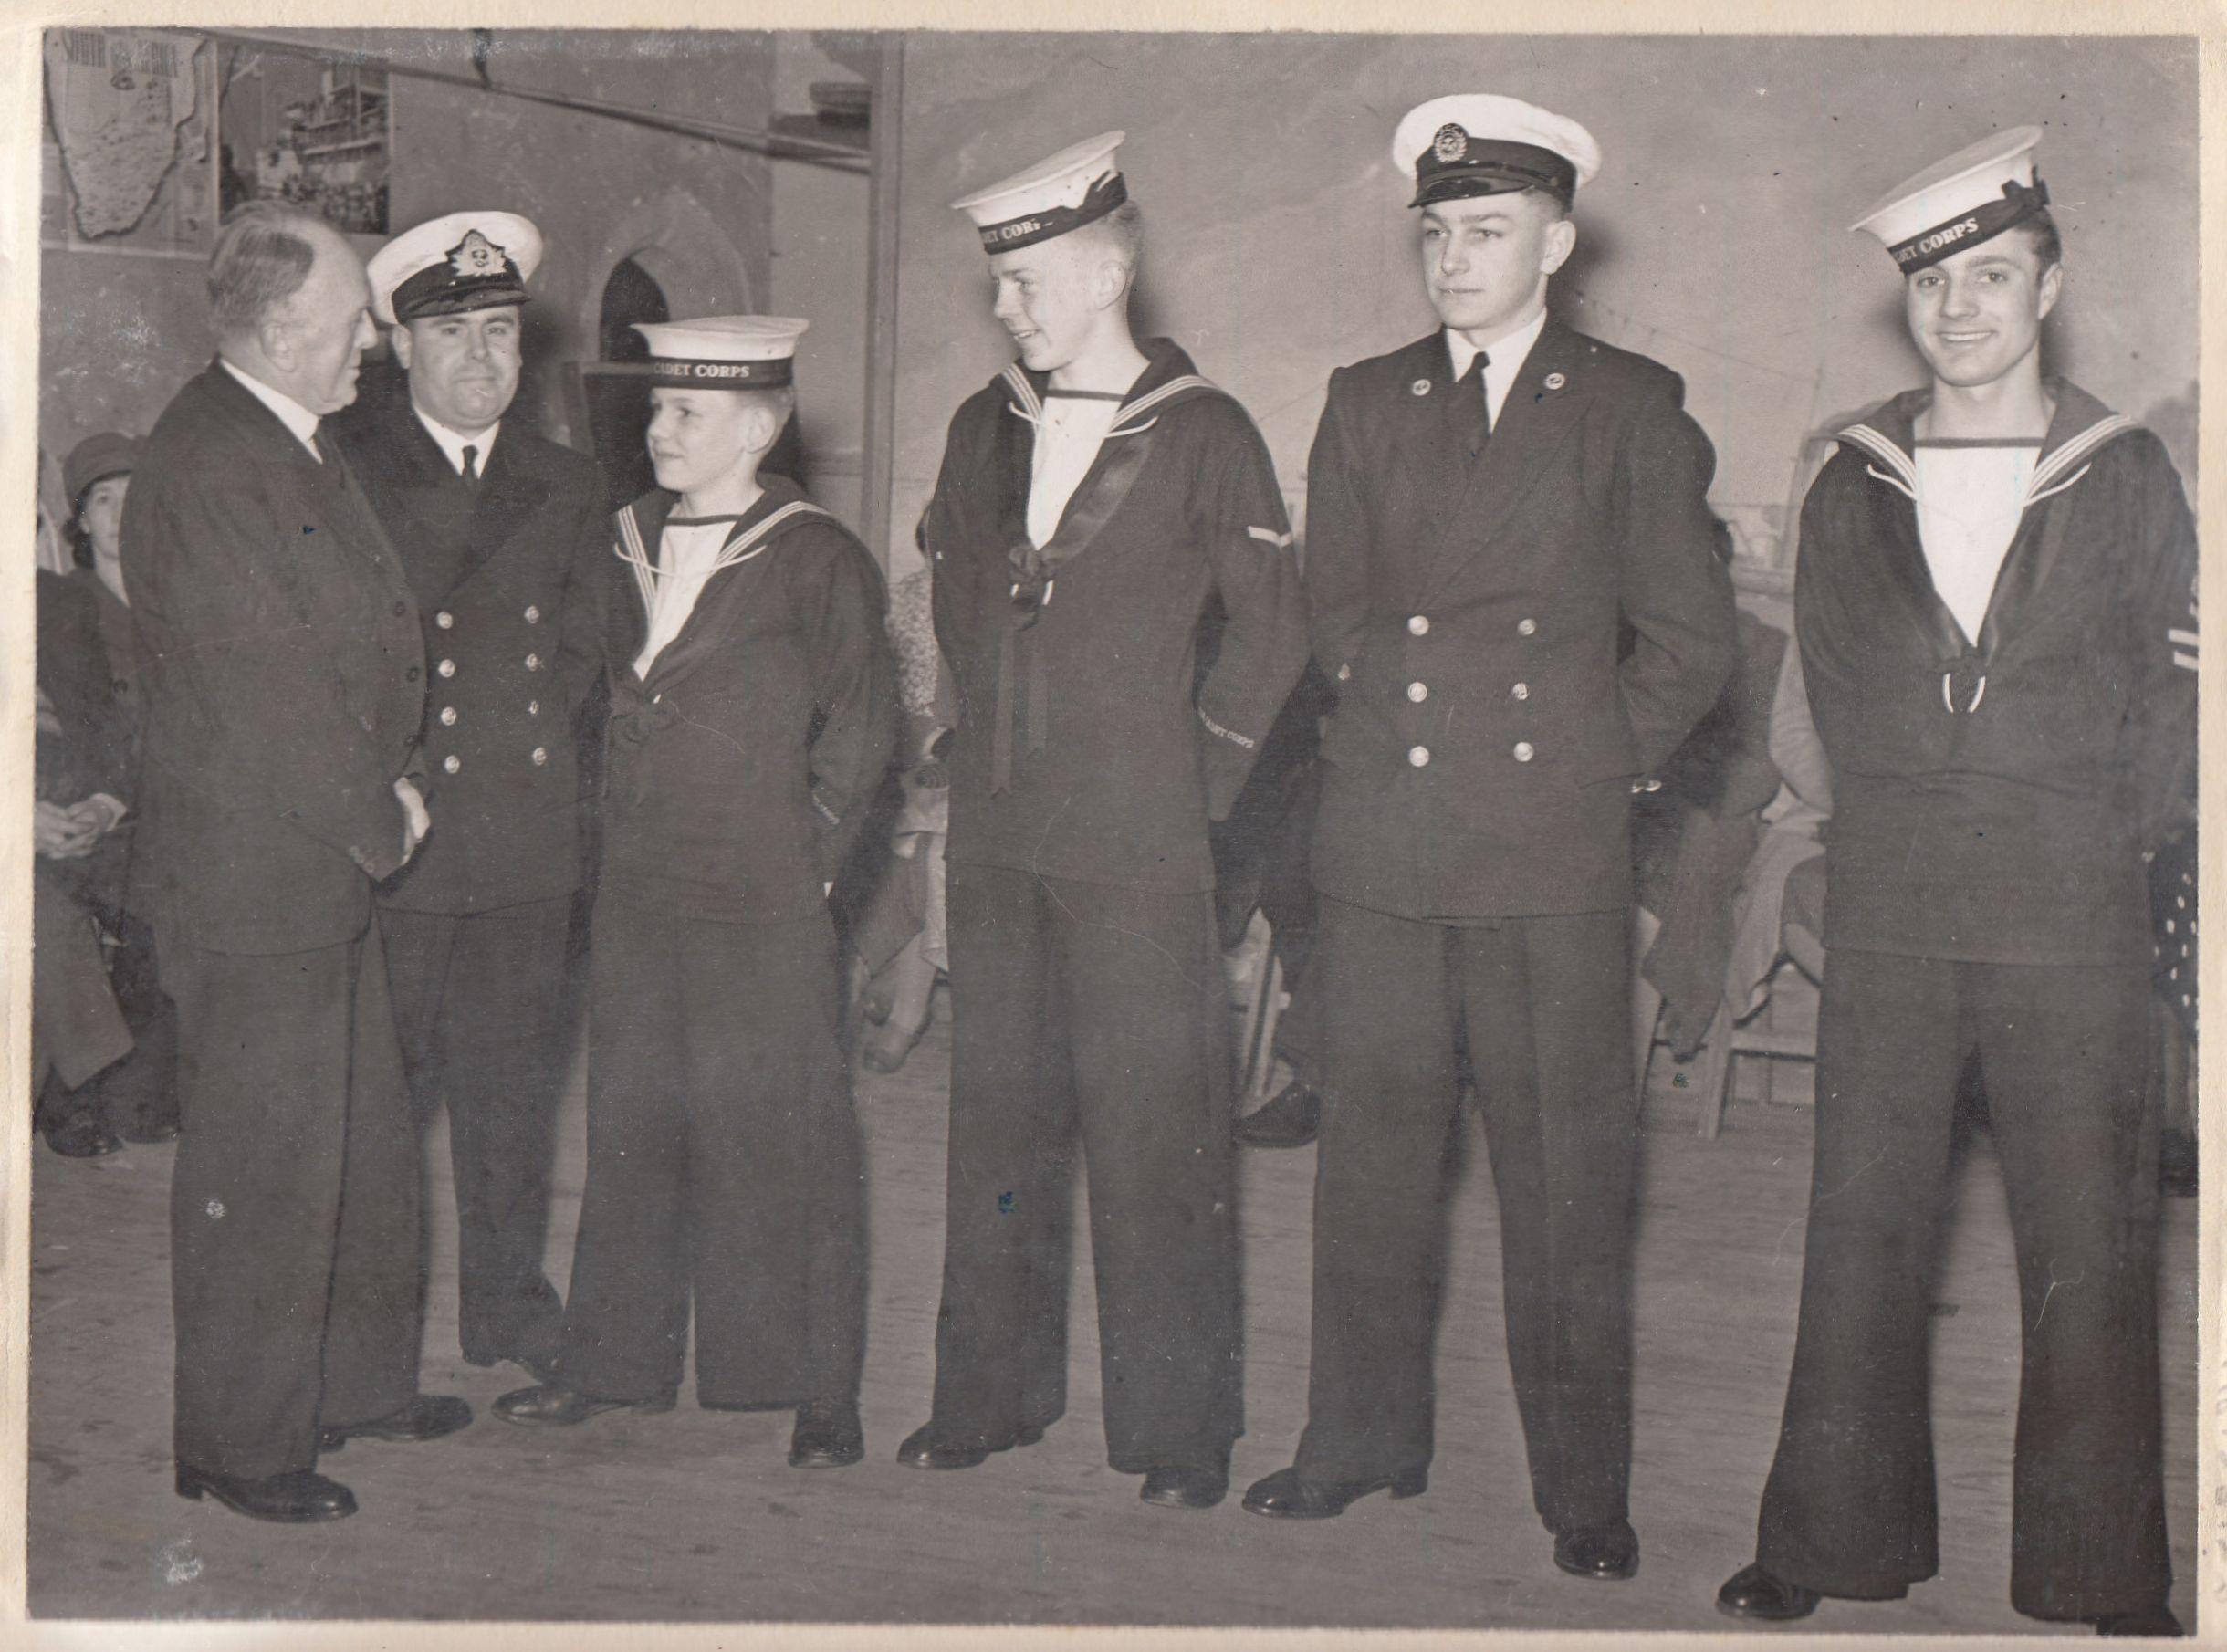 Tiverton Sea Cadets. Image courtesy of Tiverton Museum of Mid Devon Life.